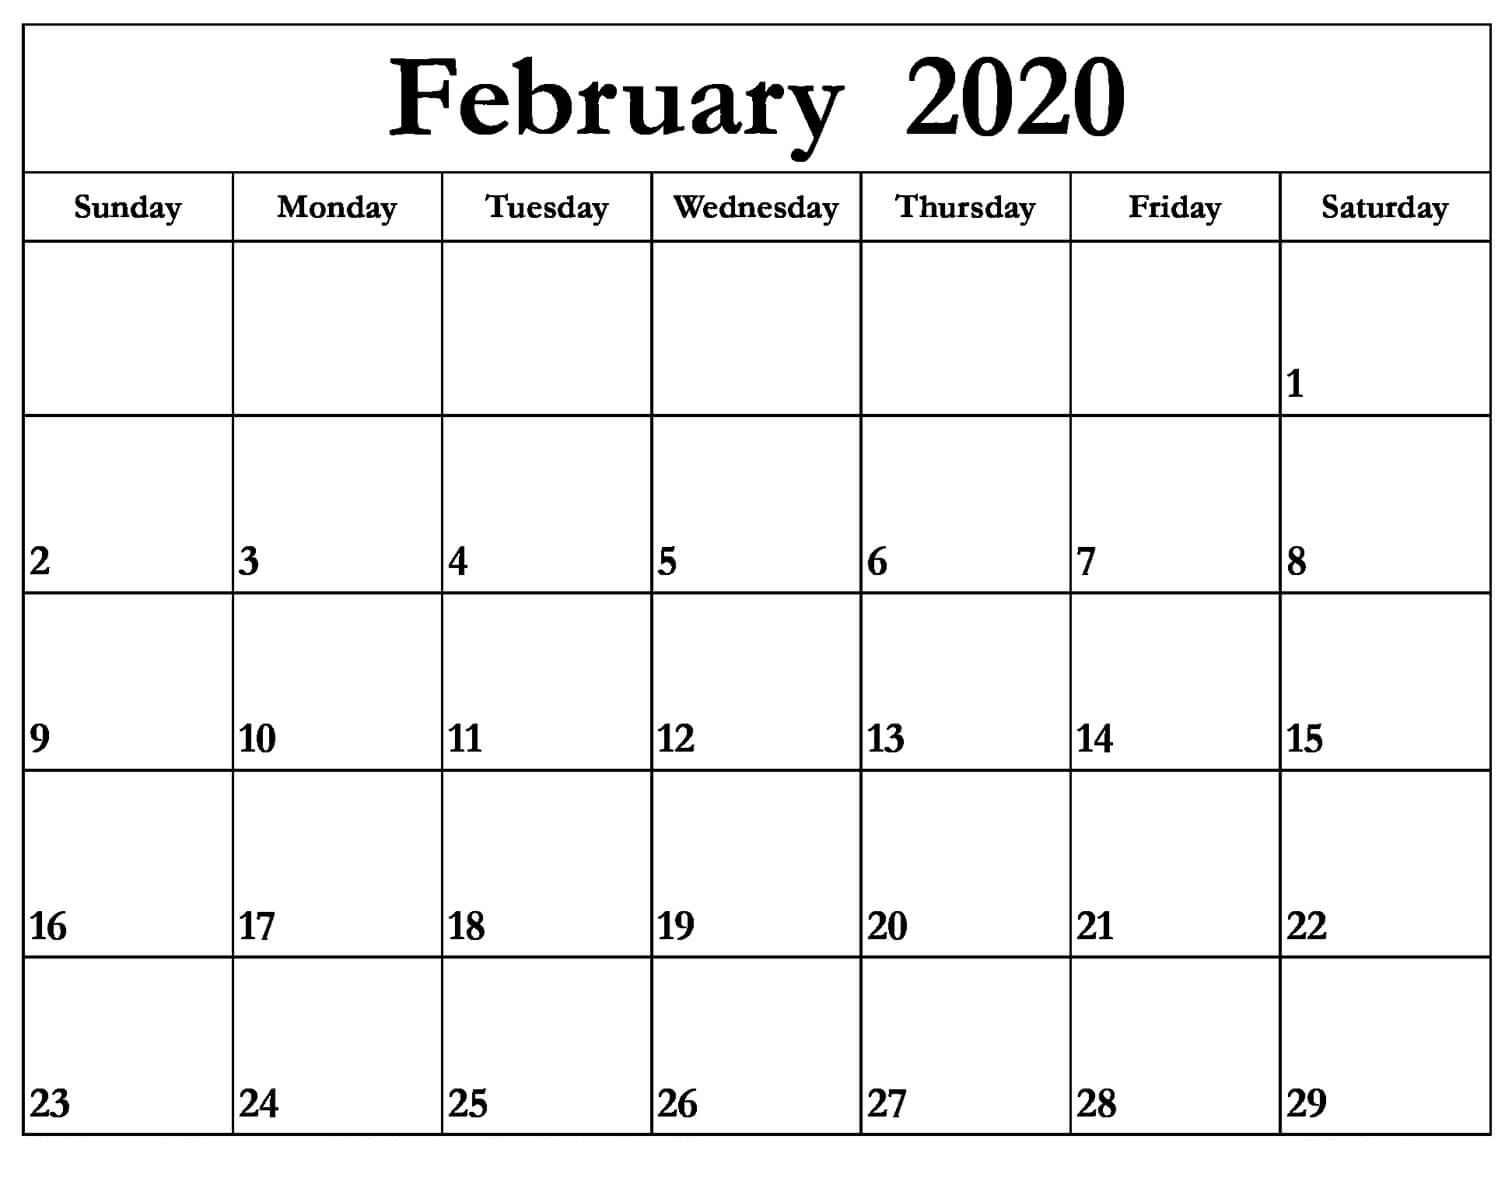 February 2020 Calendar Word Excel & Pdf | 12 Month Printable in Feb 2020 Calendar